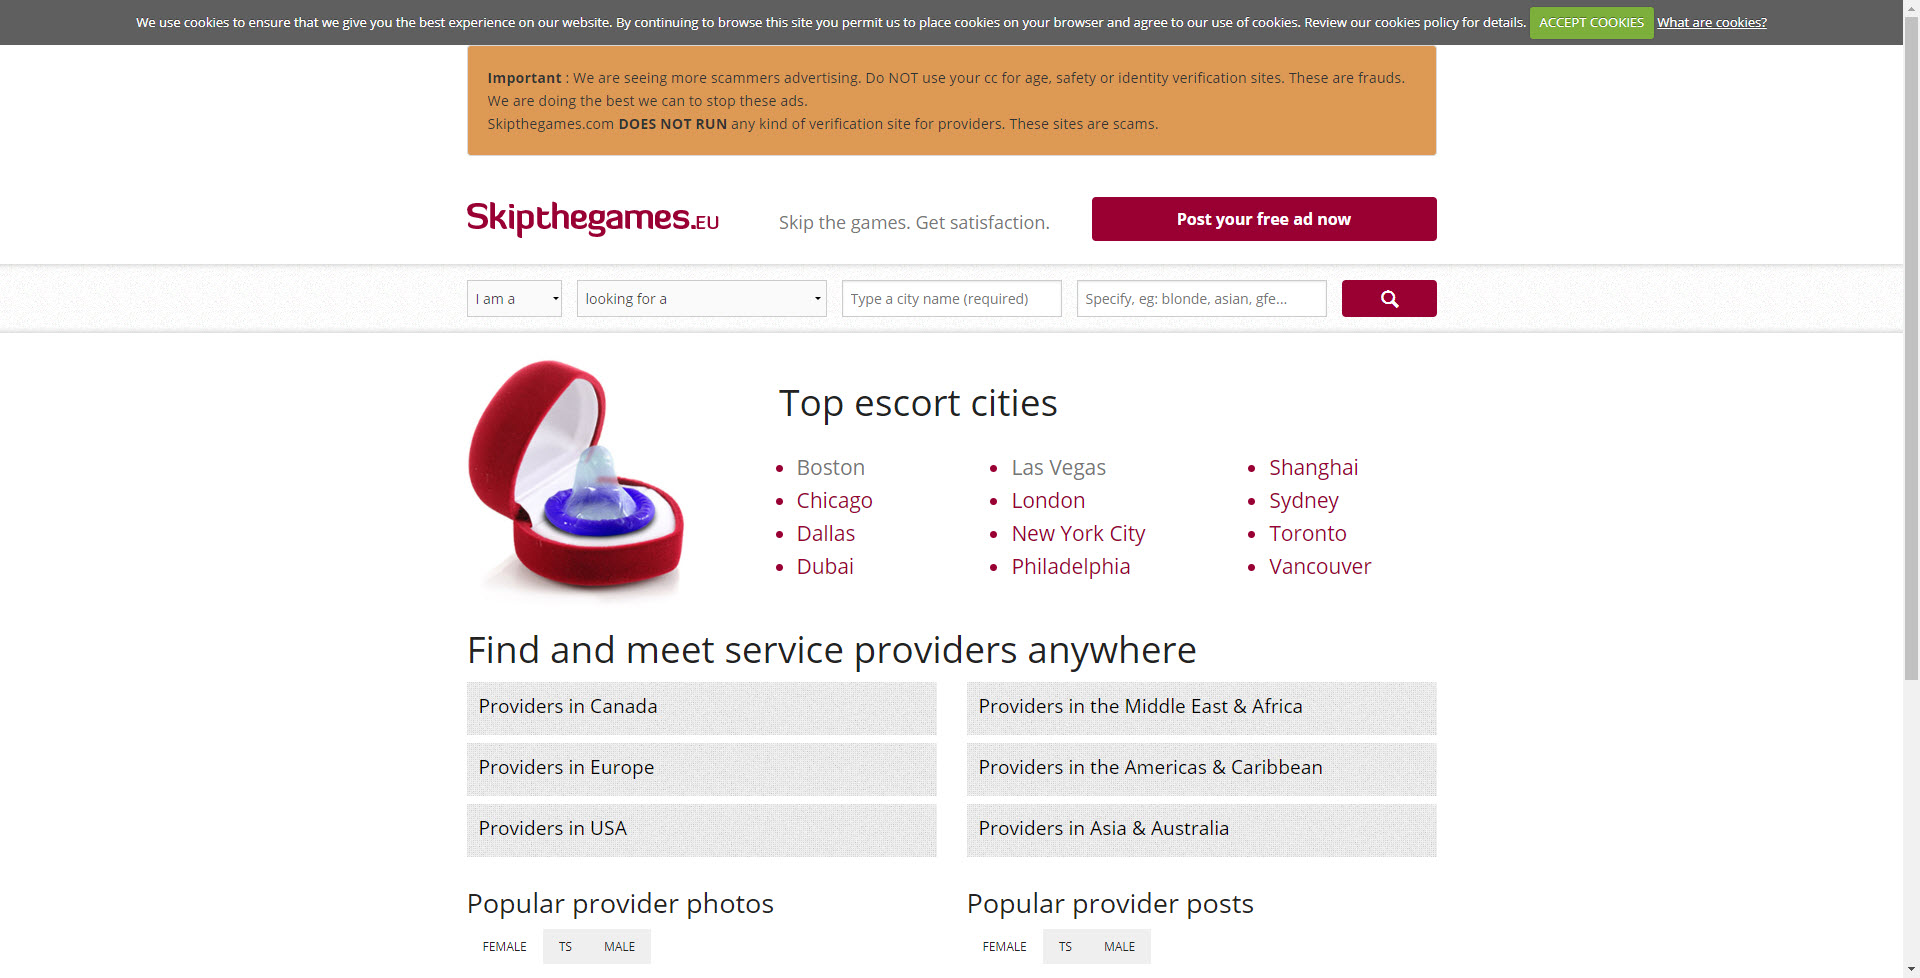 A photo of skipthegames.com